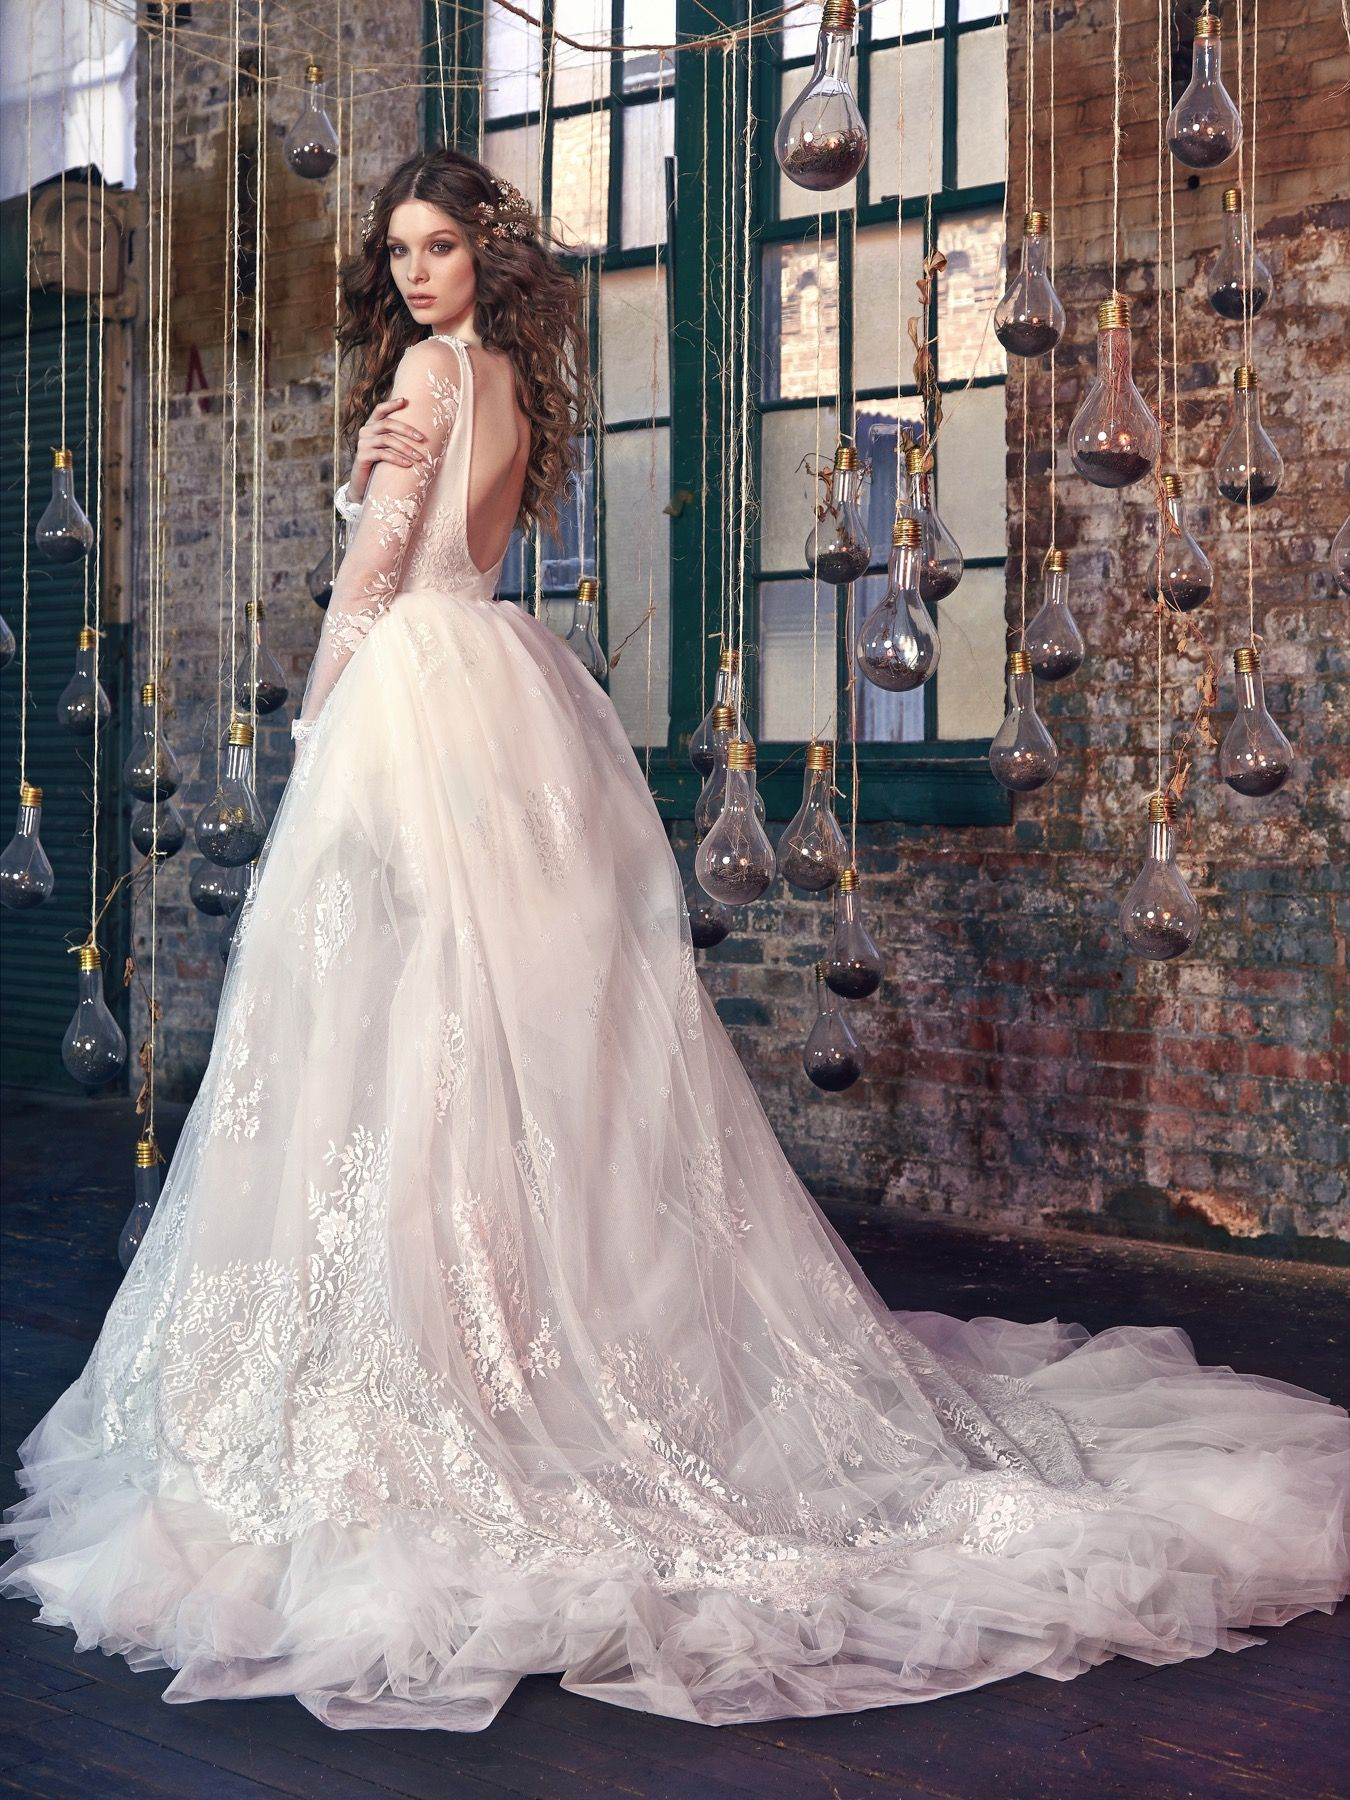 Snow White-Back | Bride | Pinterest | Galia lahav, Snow white and ...